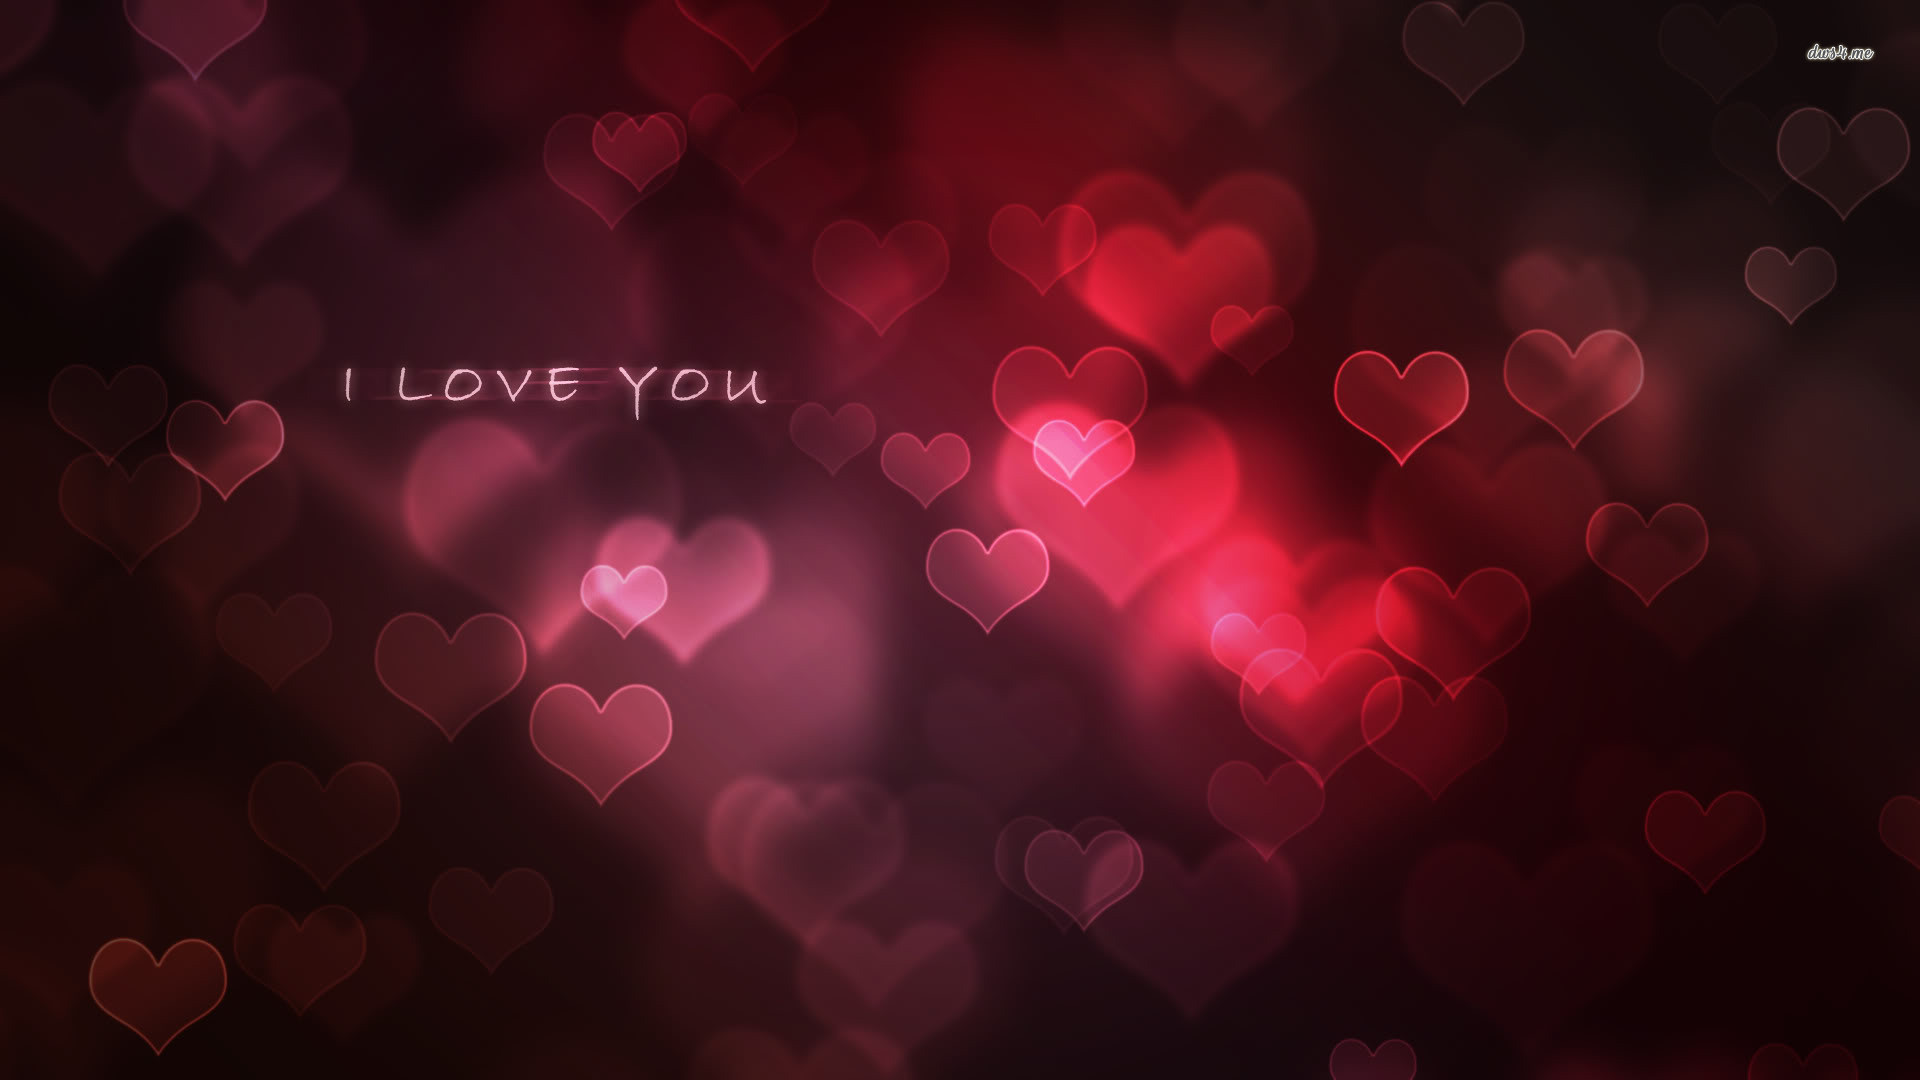 HEARTS I LOVE YOU WALLPAPER. DOWNLOAD